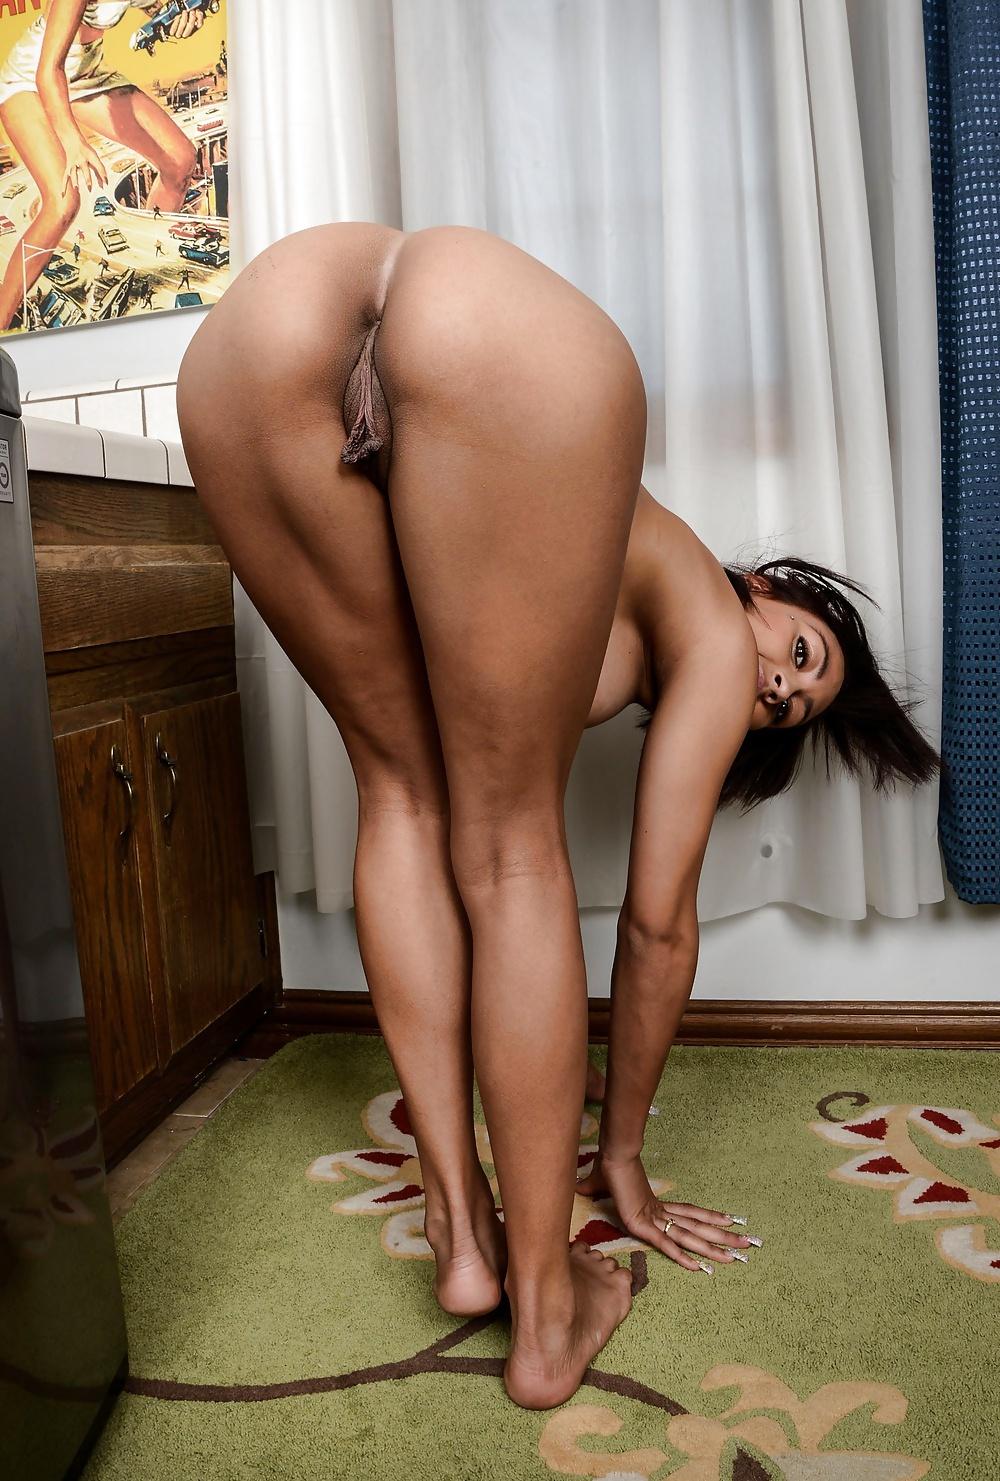 Big girls bent over naked